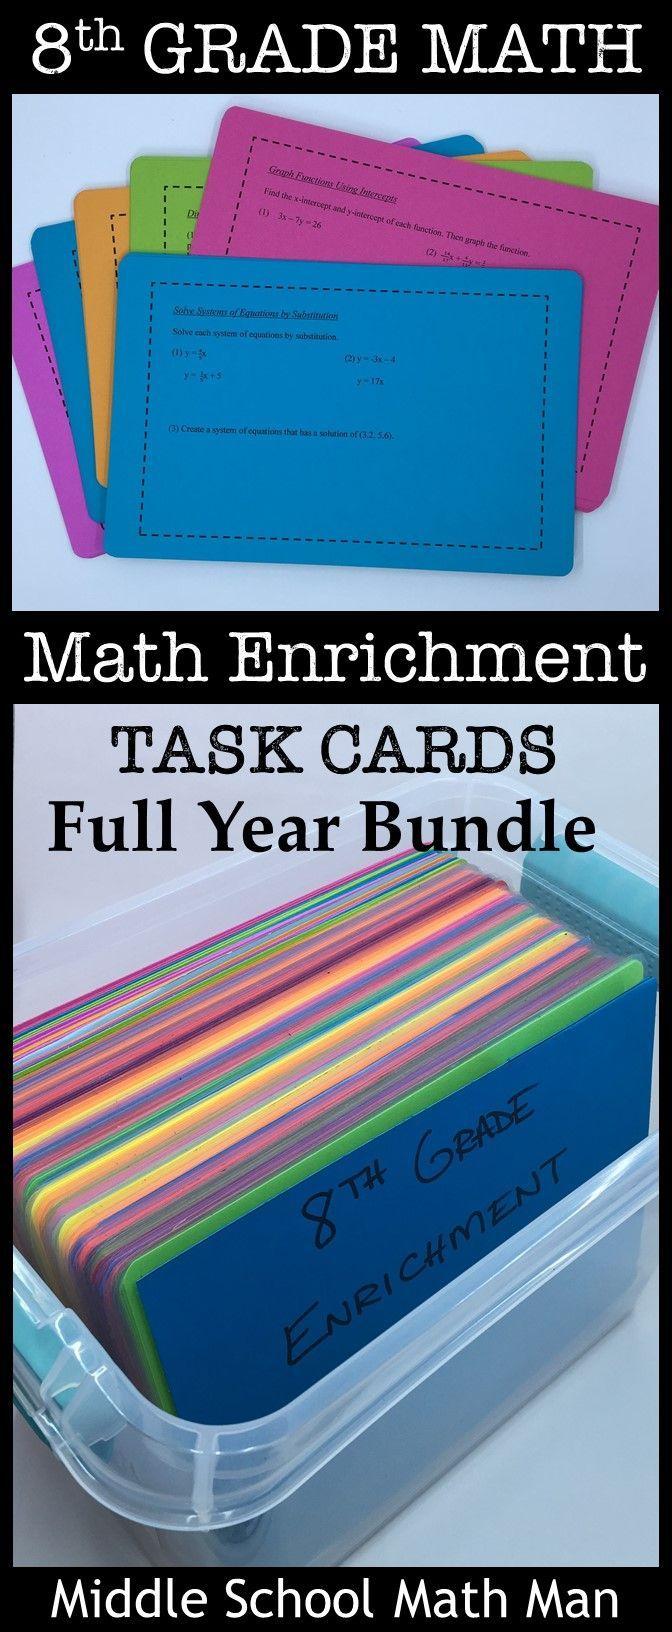 805 best Education images on Pinterest   High school maths, Math ...